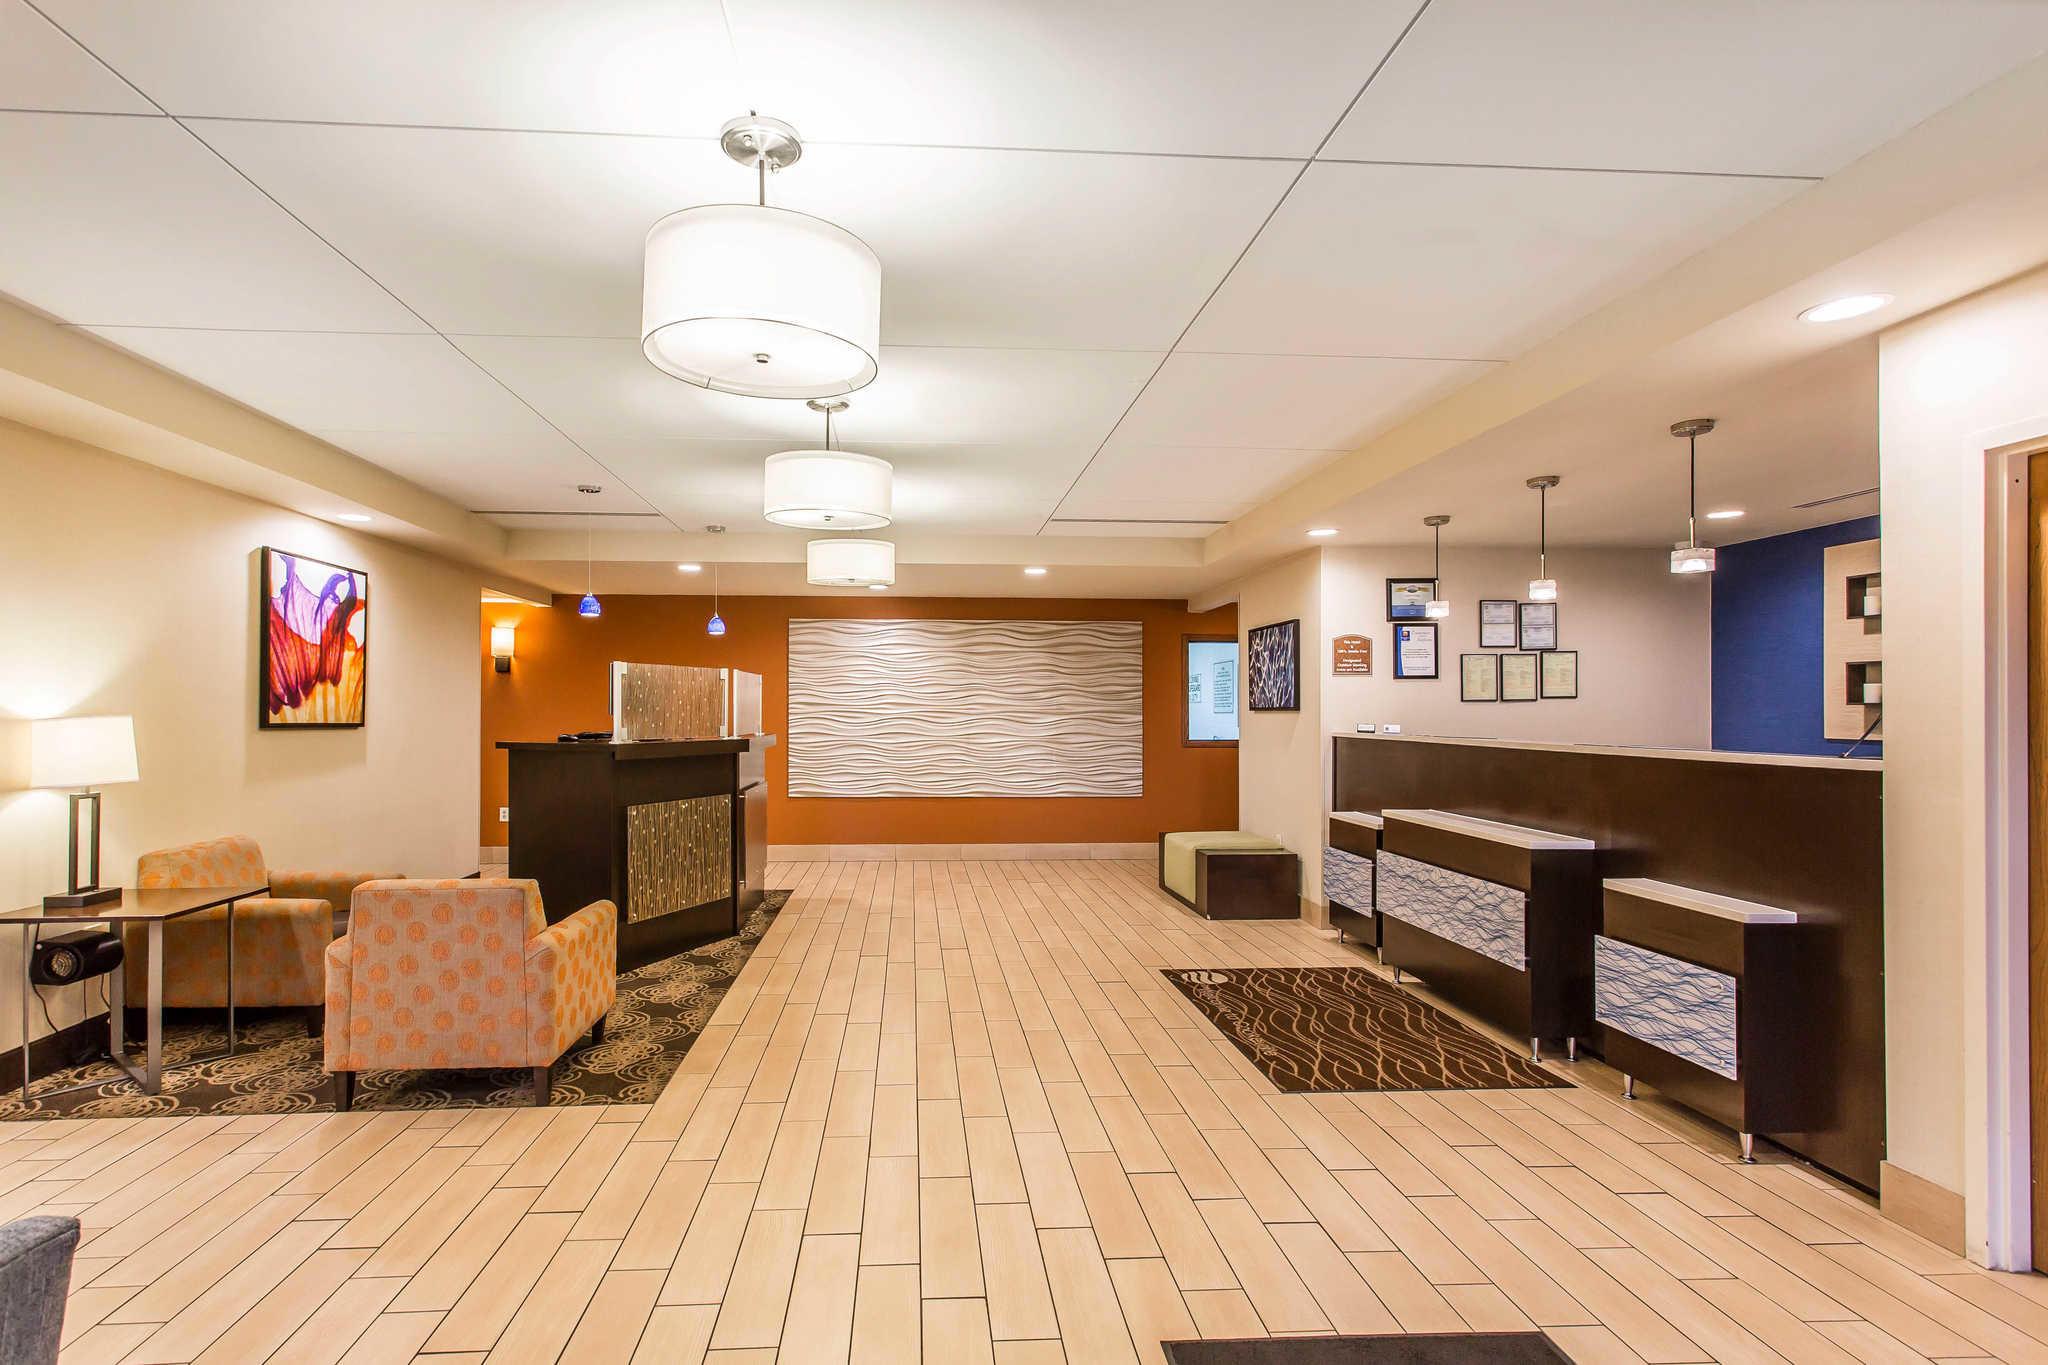 Comfort Inn & Suites image 3